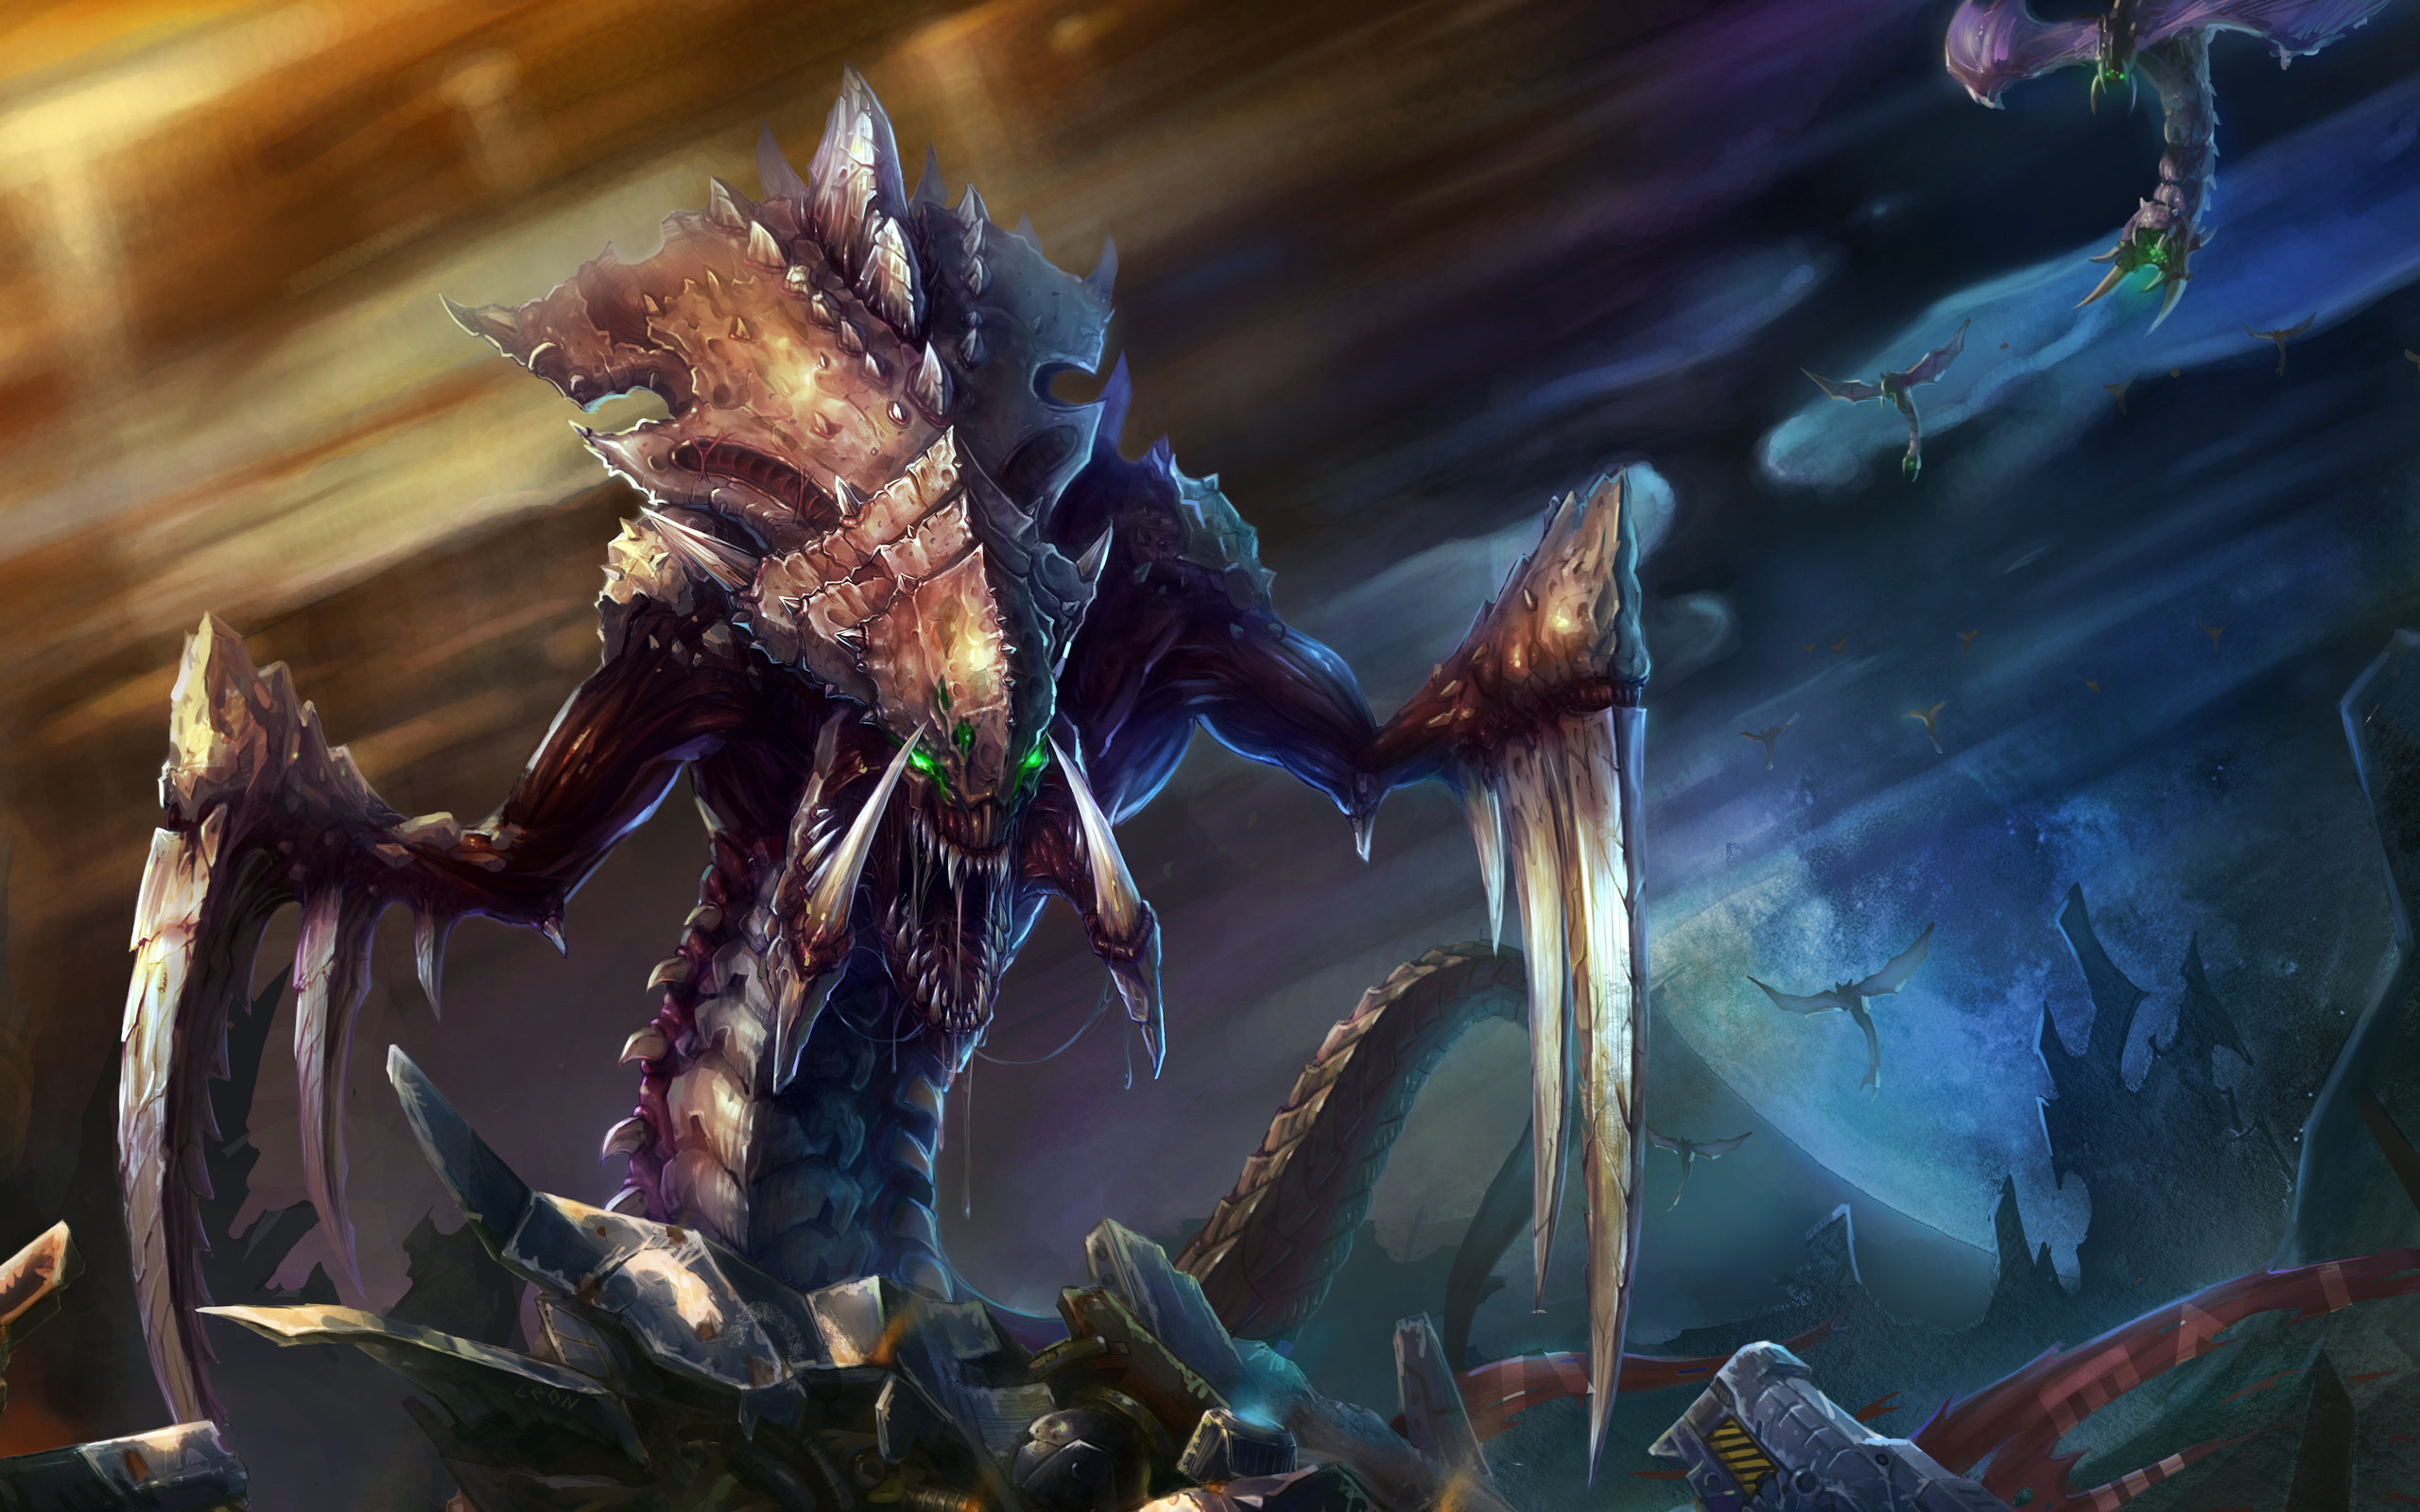 Starcraft wallpapers pictures images - Zerg wallpaper ...